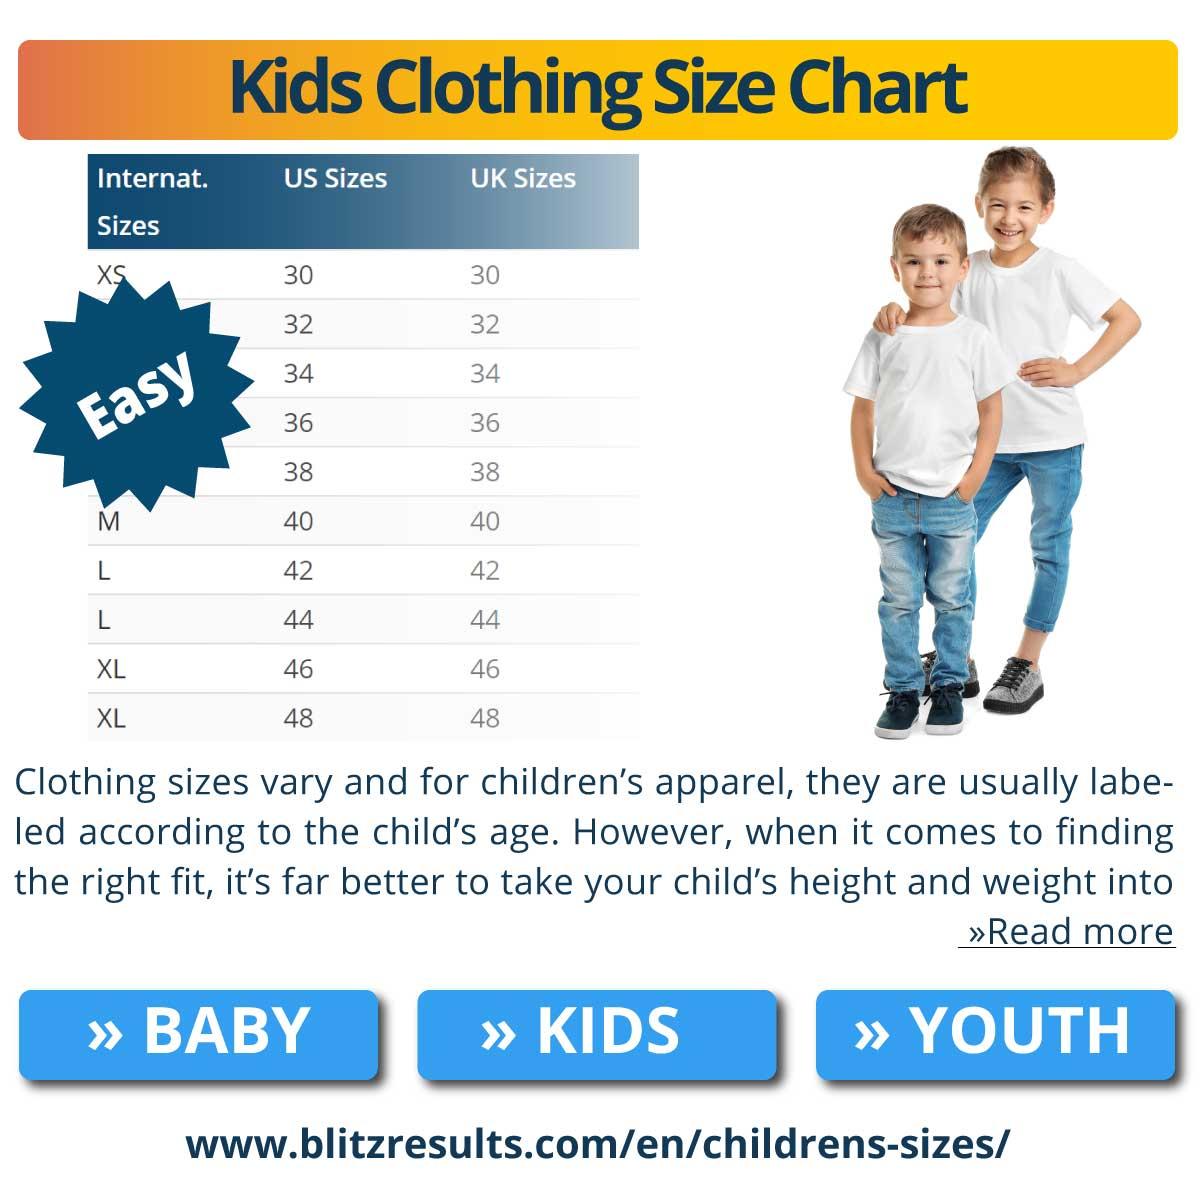 Kids Clothing Size Chart